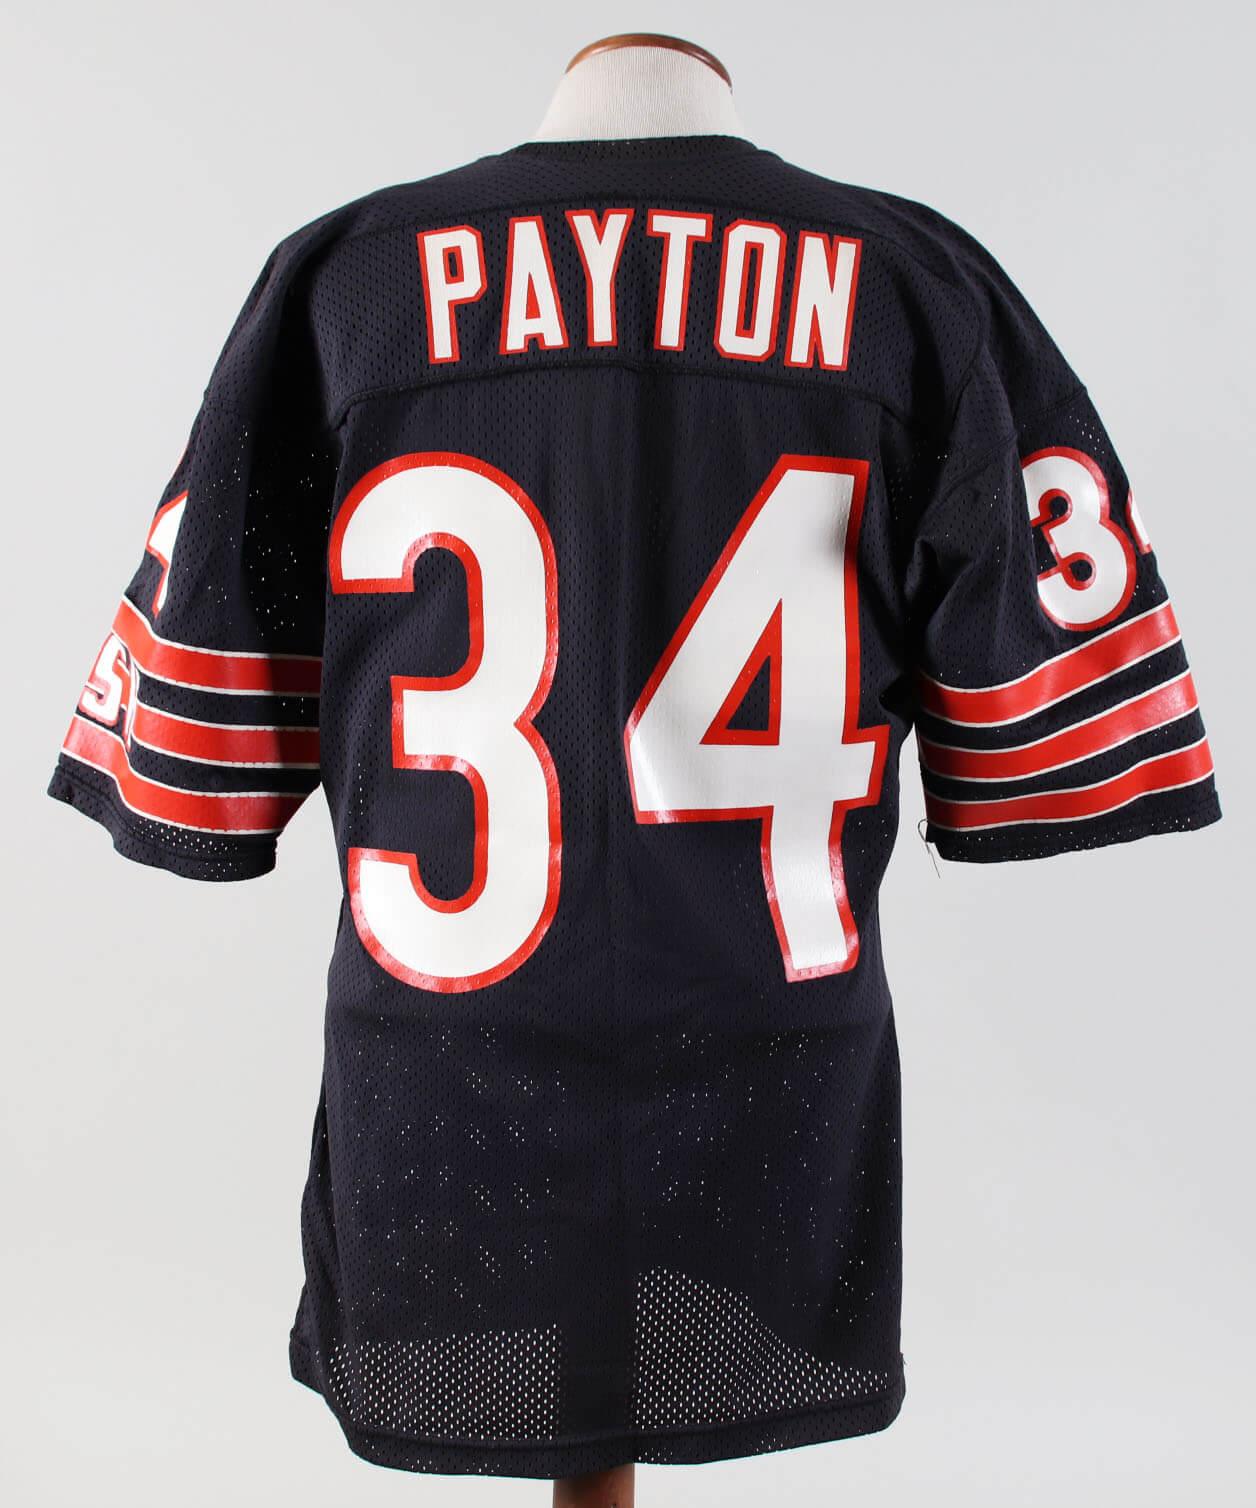 a20f89f3942 Walter Payton Game-Worn Jersey-Bears 1985 | Memorabilia Expert